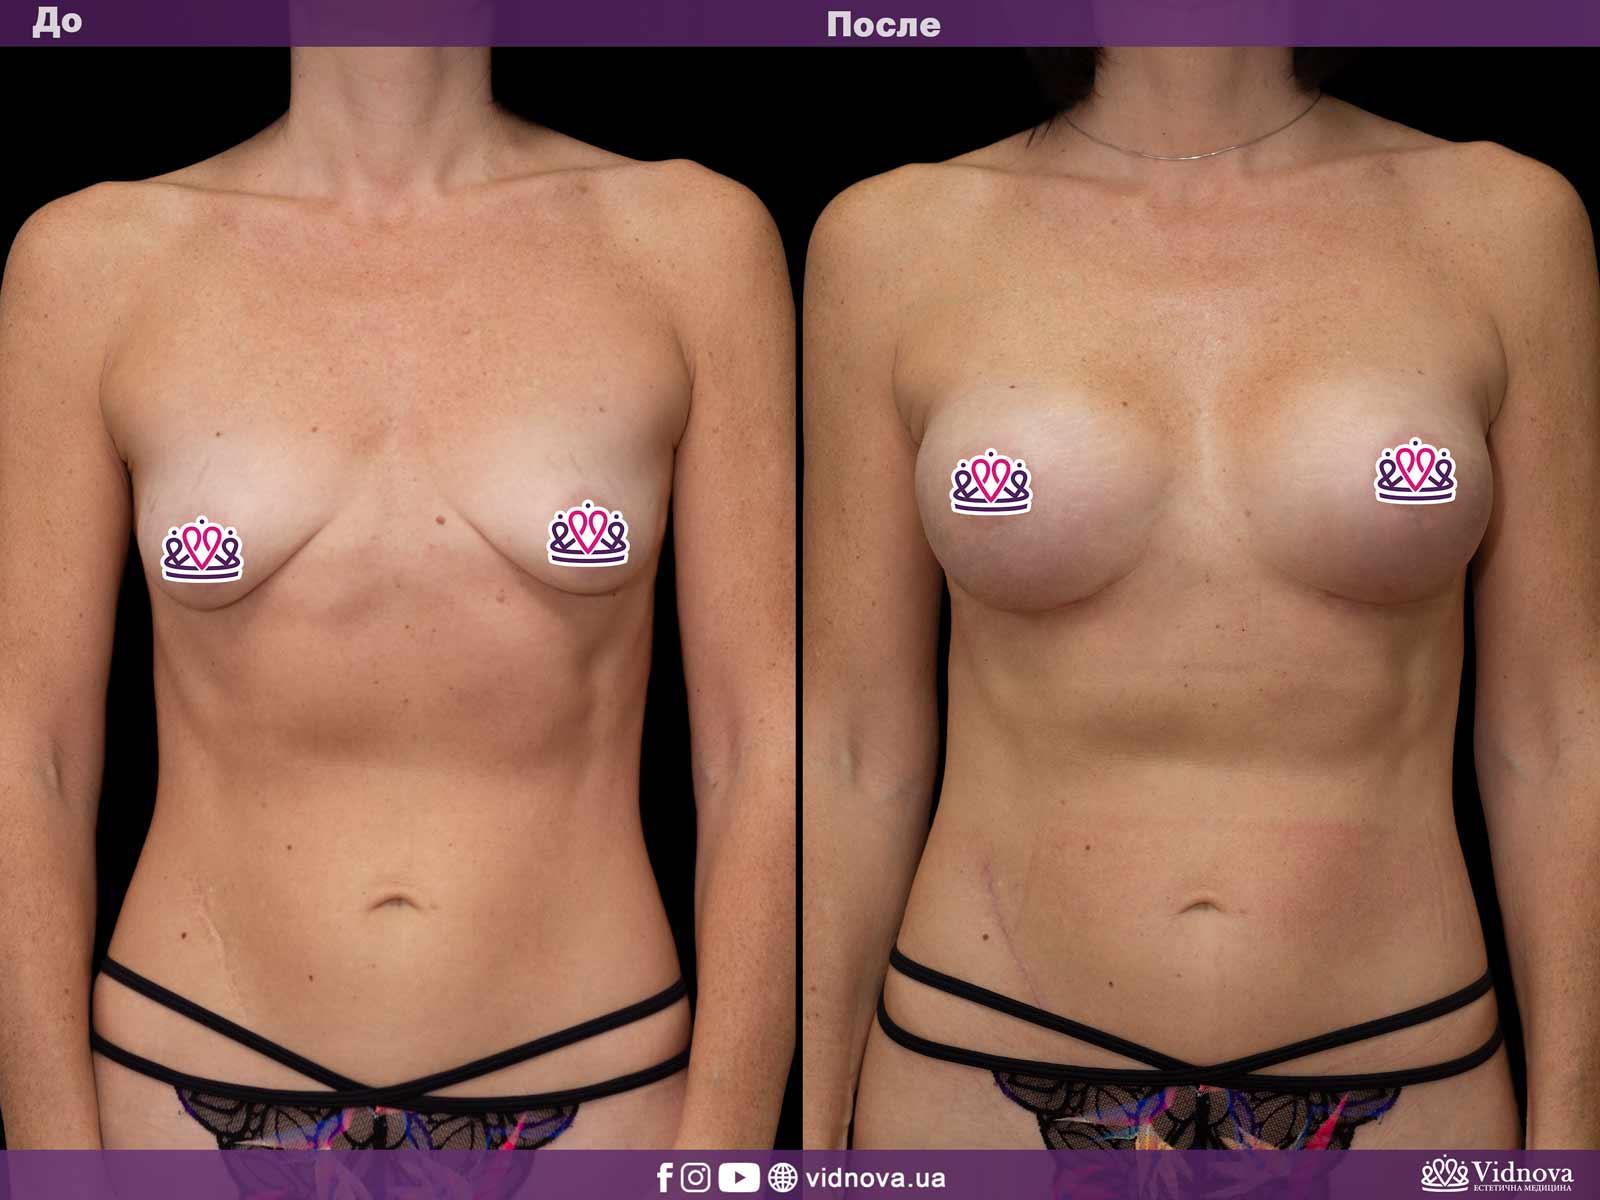 Увеличение груди: Фото ДО и ПОСЛЕ - Пример №38-1 - Клиника Vidnova